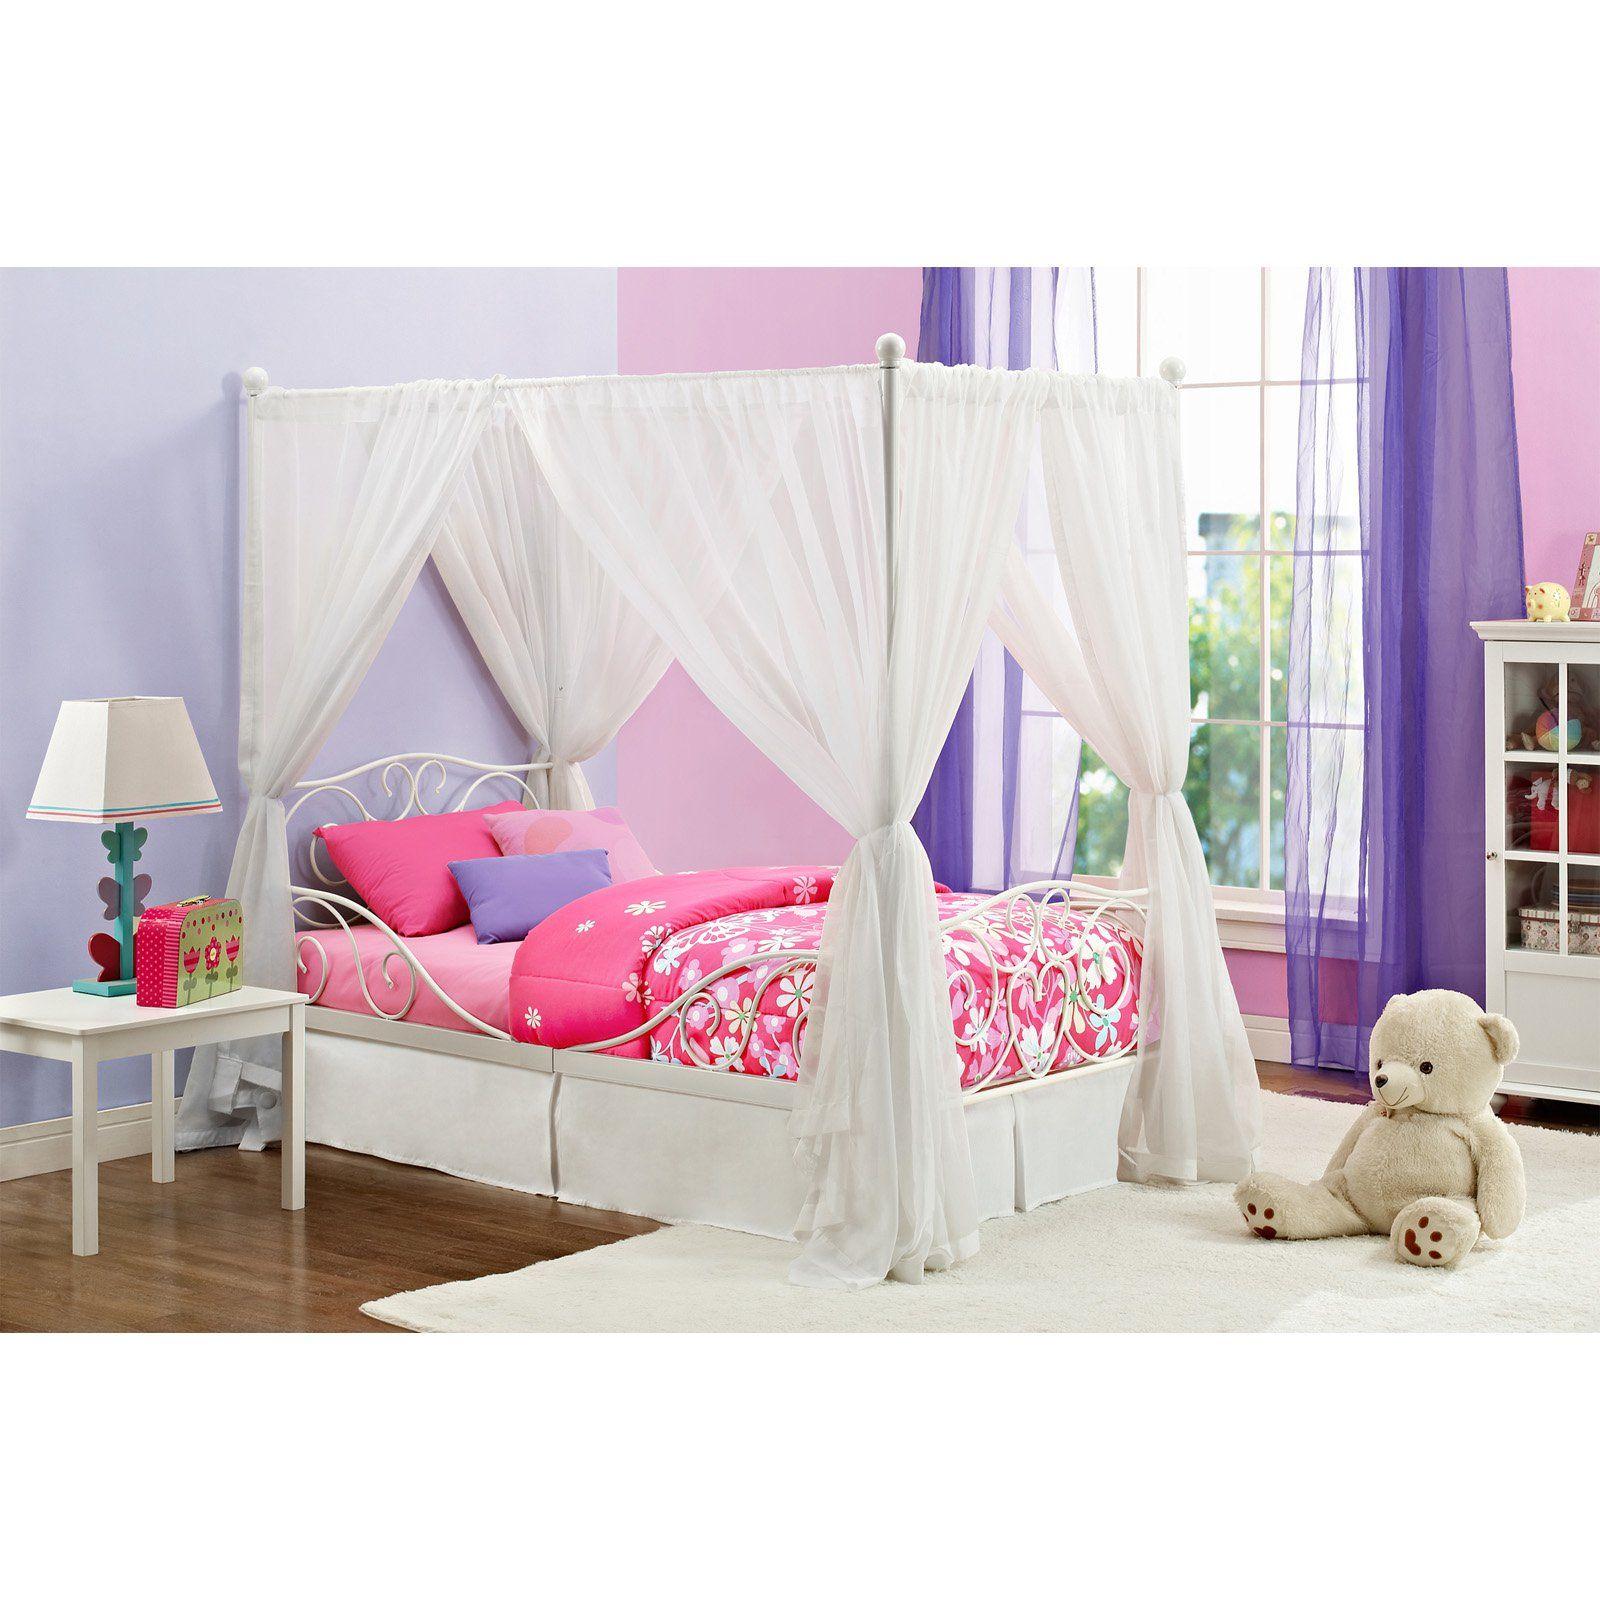 Kids Canopy Bed Standard Furniture Princess Metal